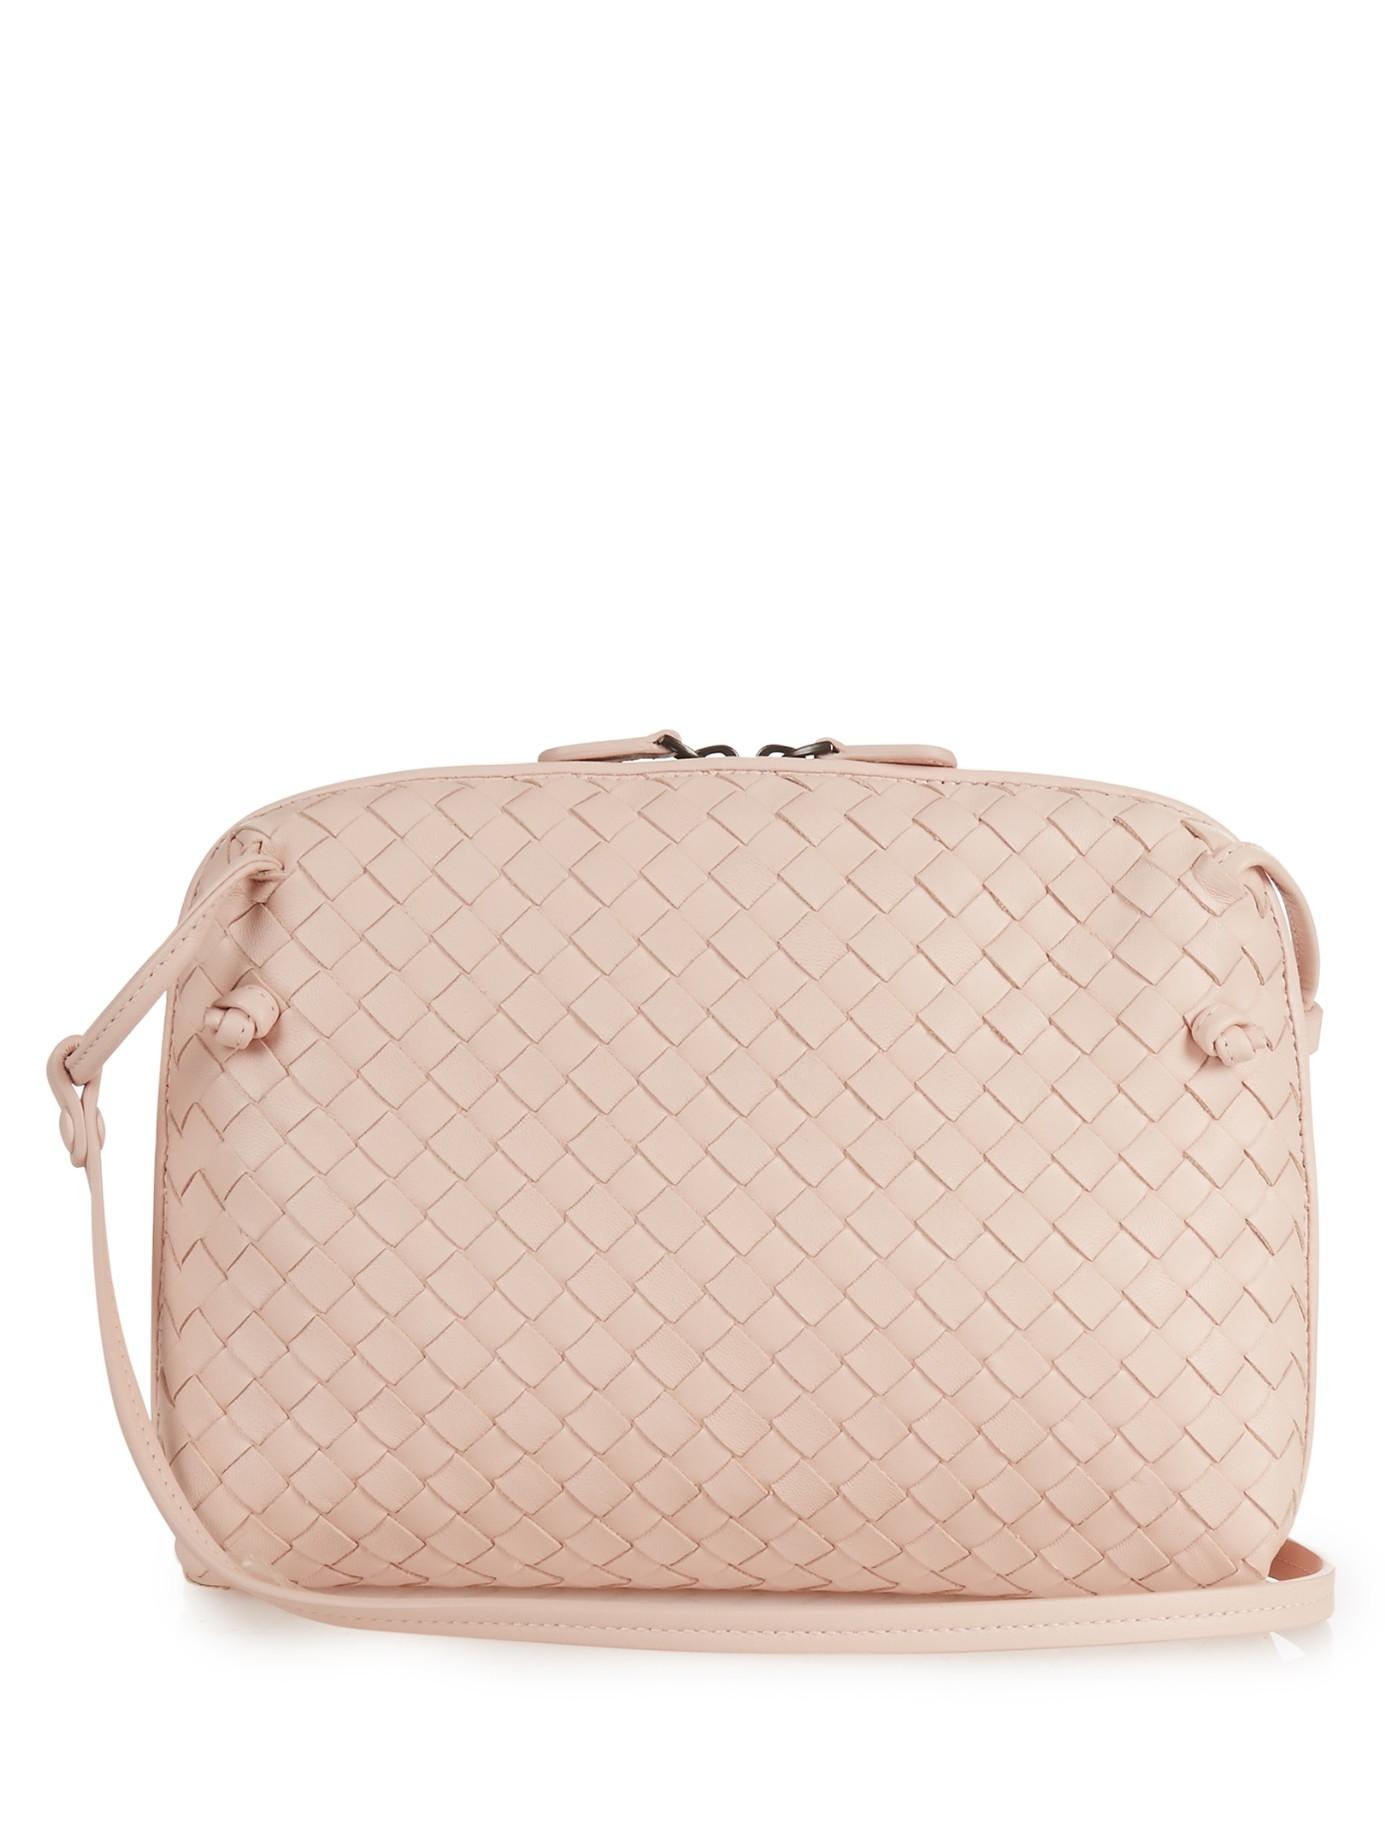 e3cd920495 Bottega Veneta Nodini Intrecciato Leather Cross-body Bag in Pink - Lyst